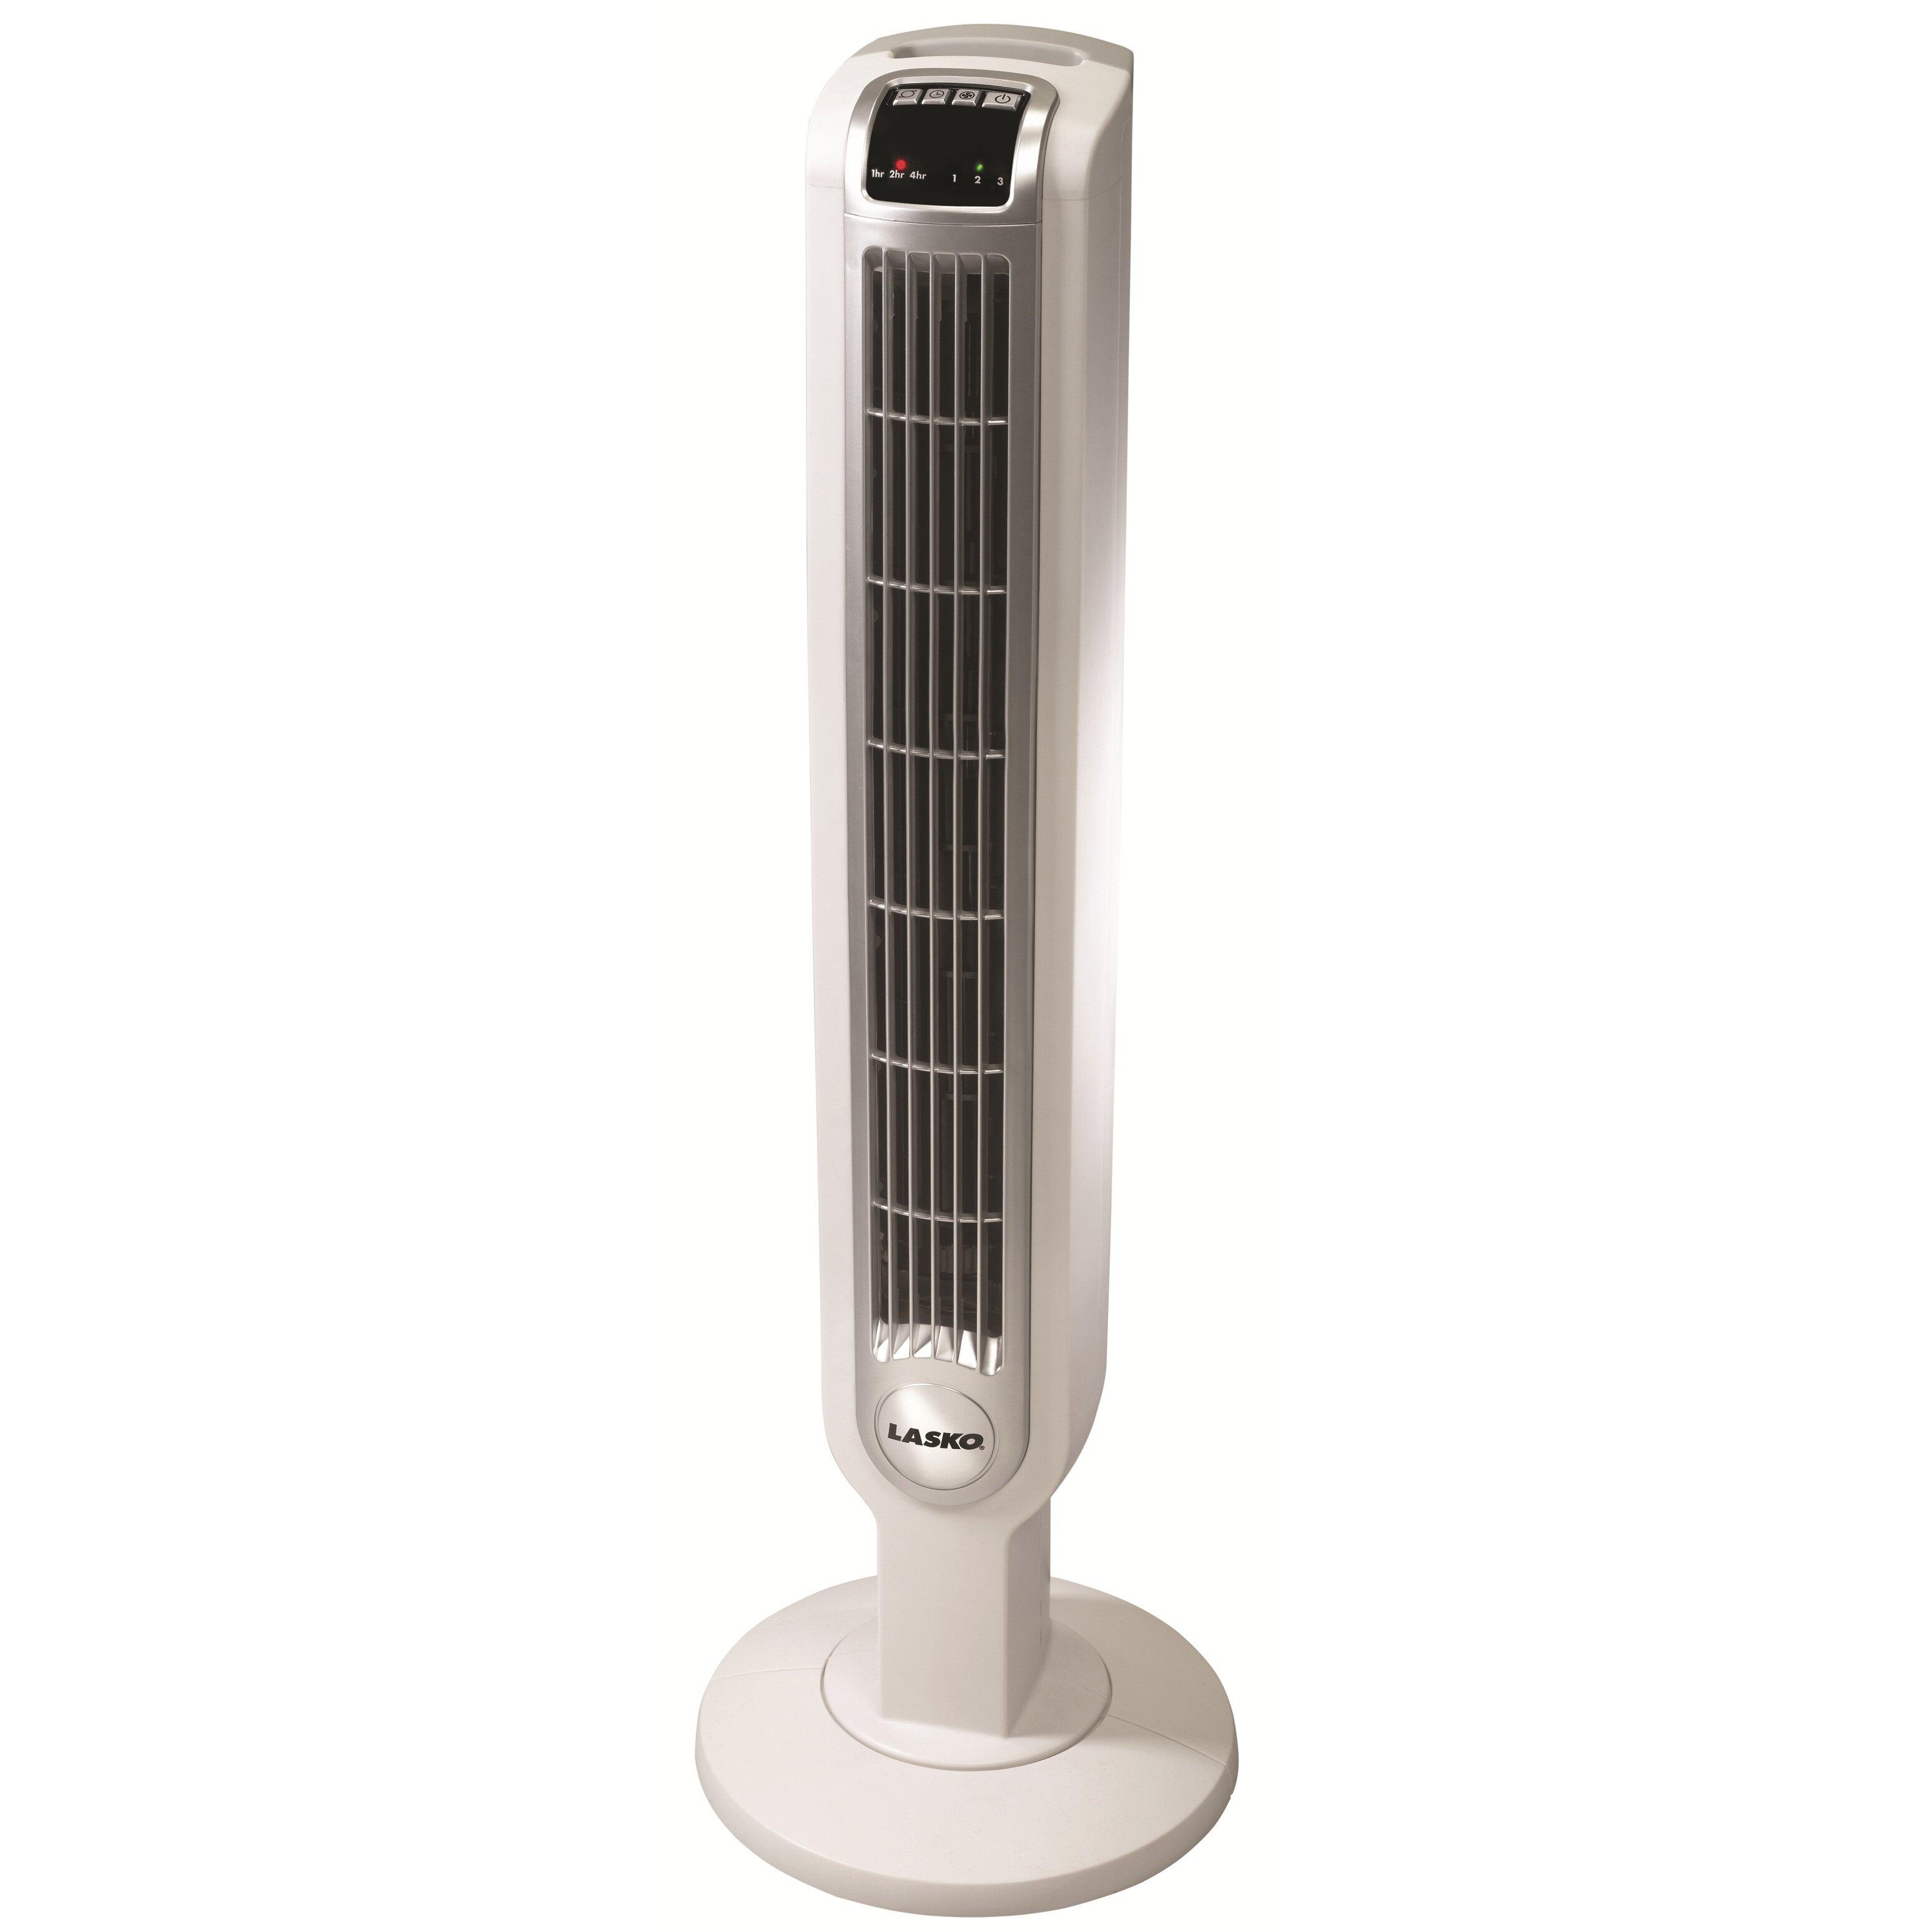 "Lasko 36"" Oscillating Tower Fan with Remote Control ..."